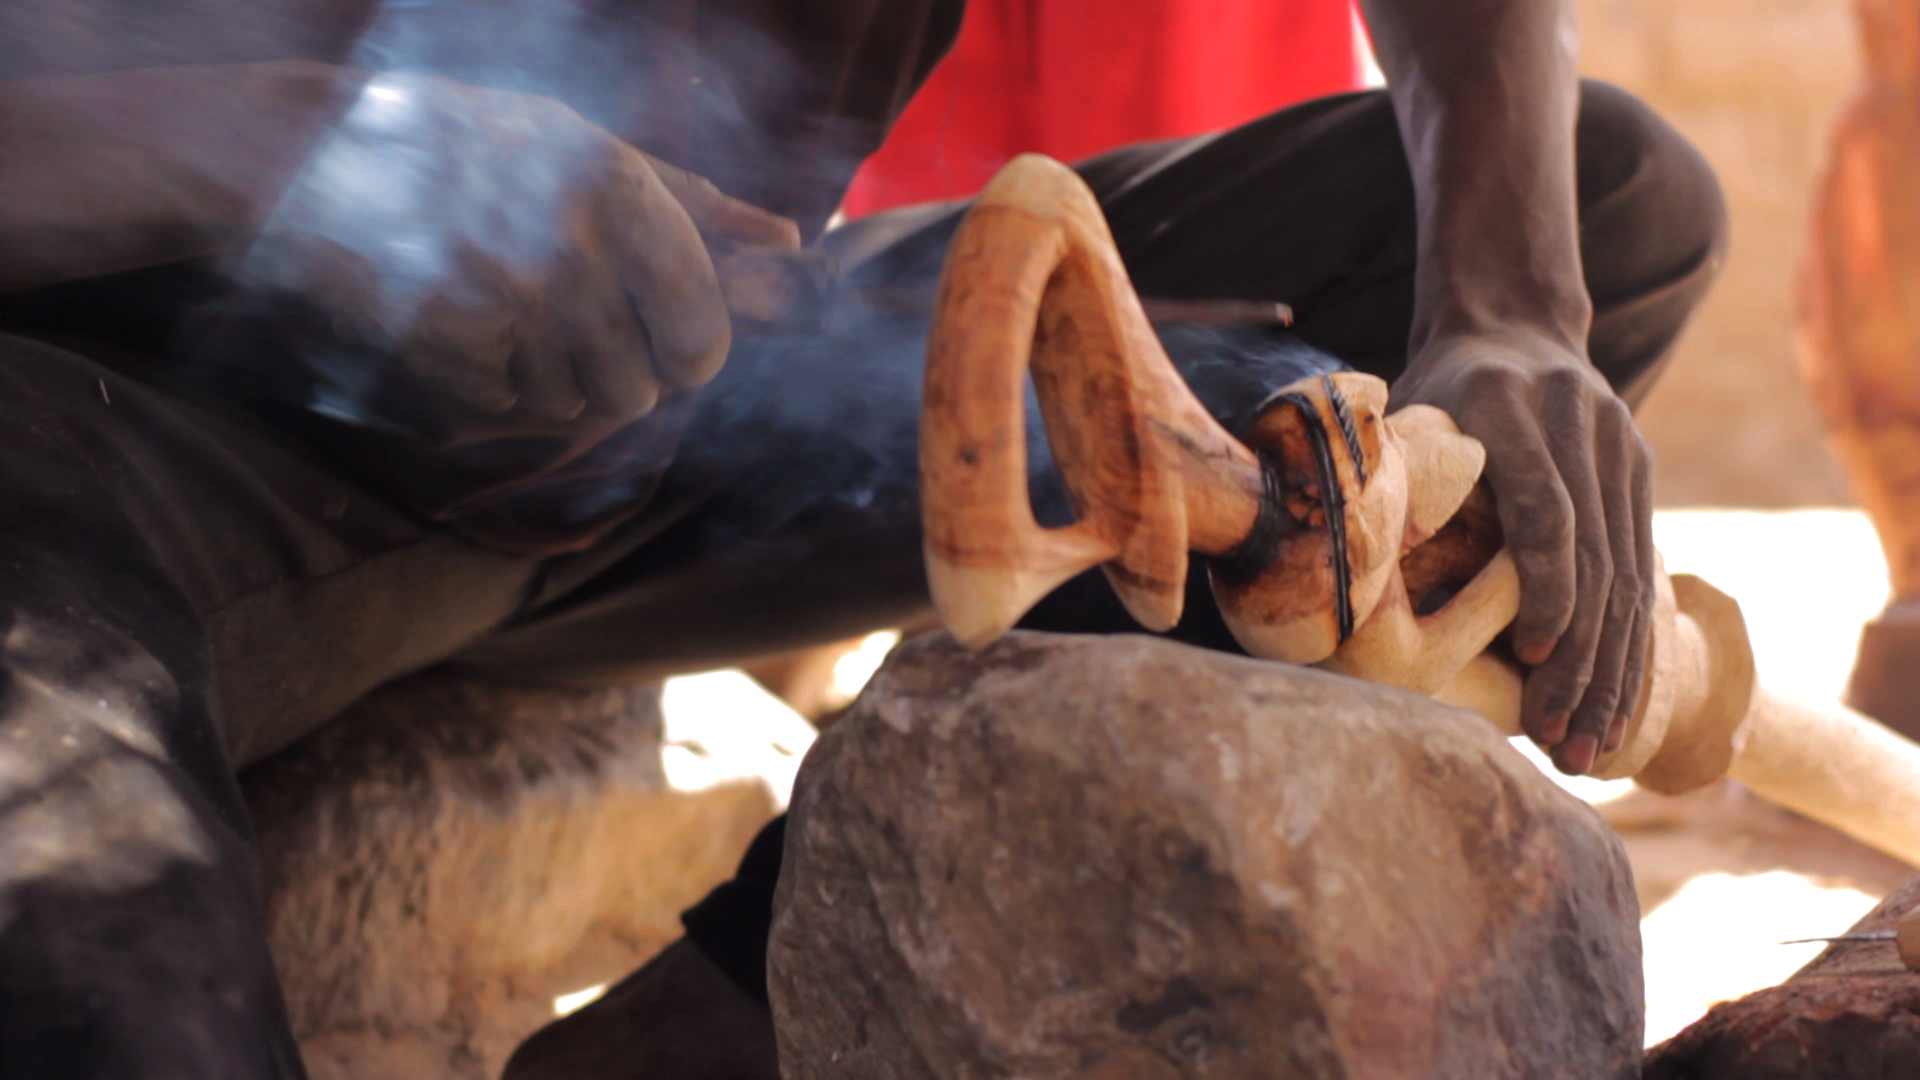 dogon pablocaminante herrero fuego - Malí 8, País Dogon V: moda, arte y religión